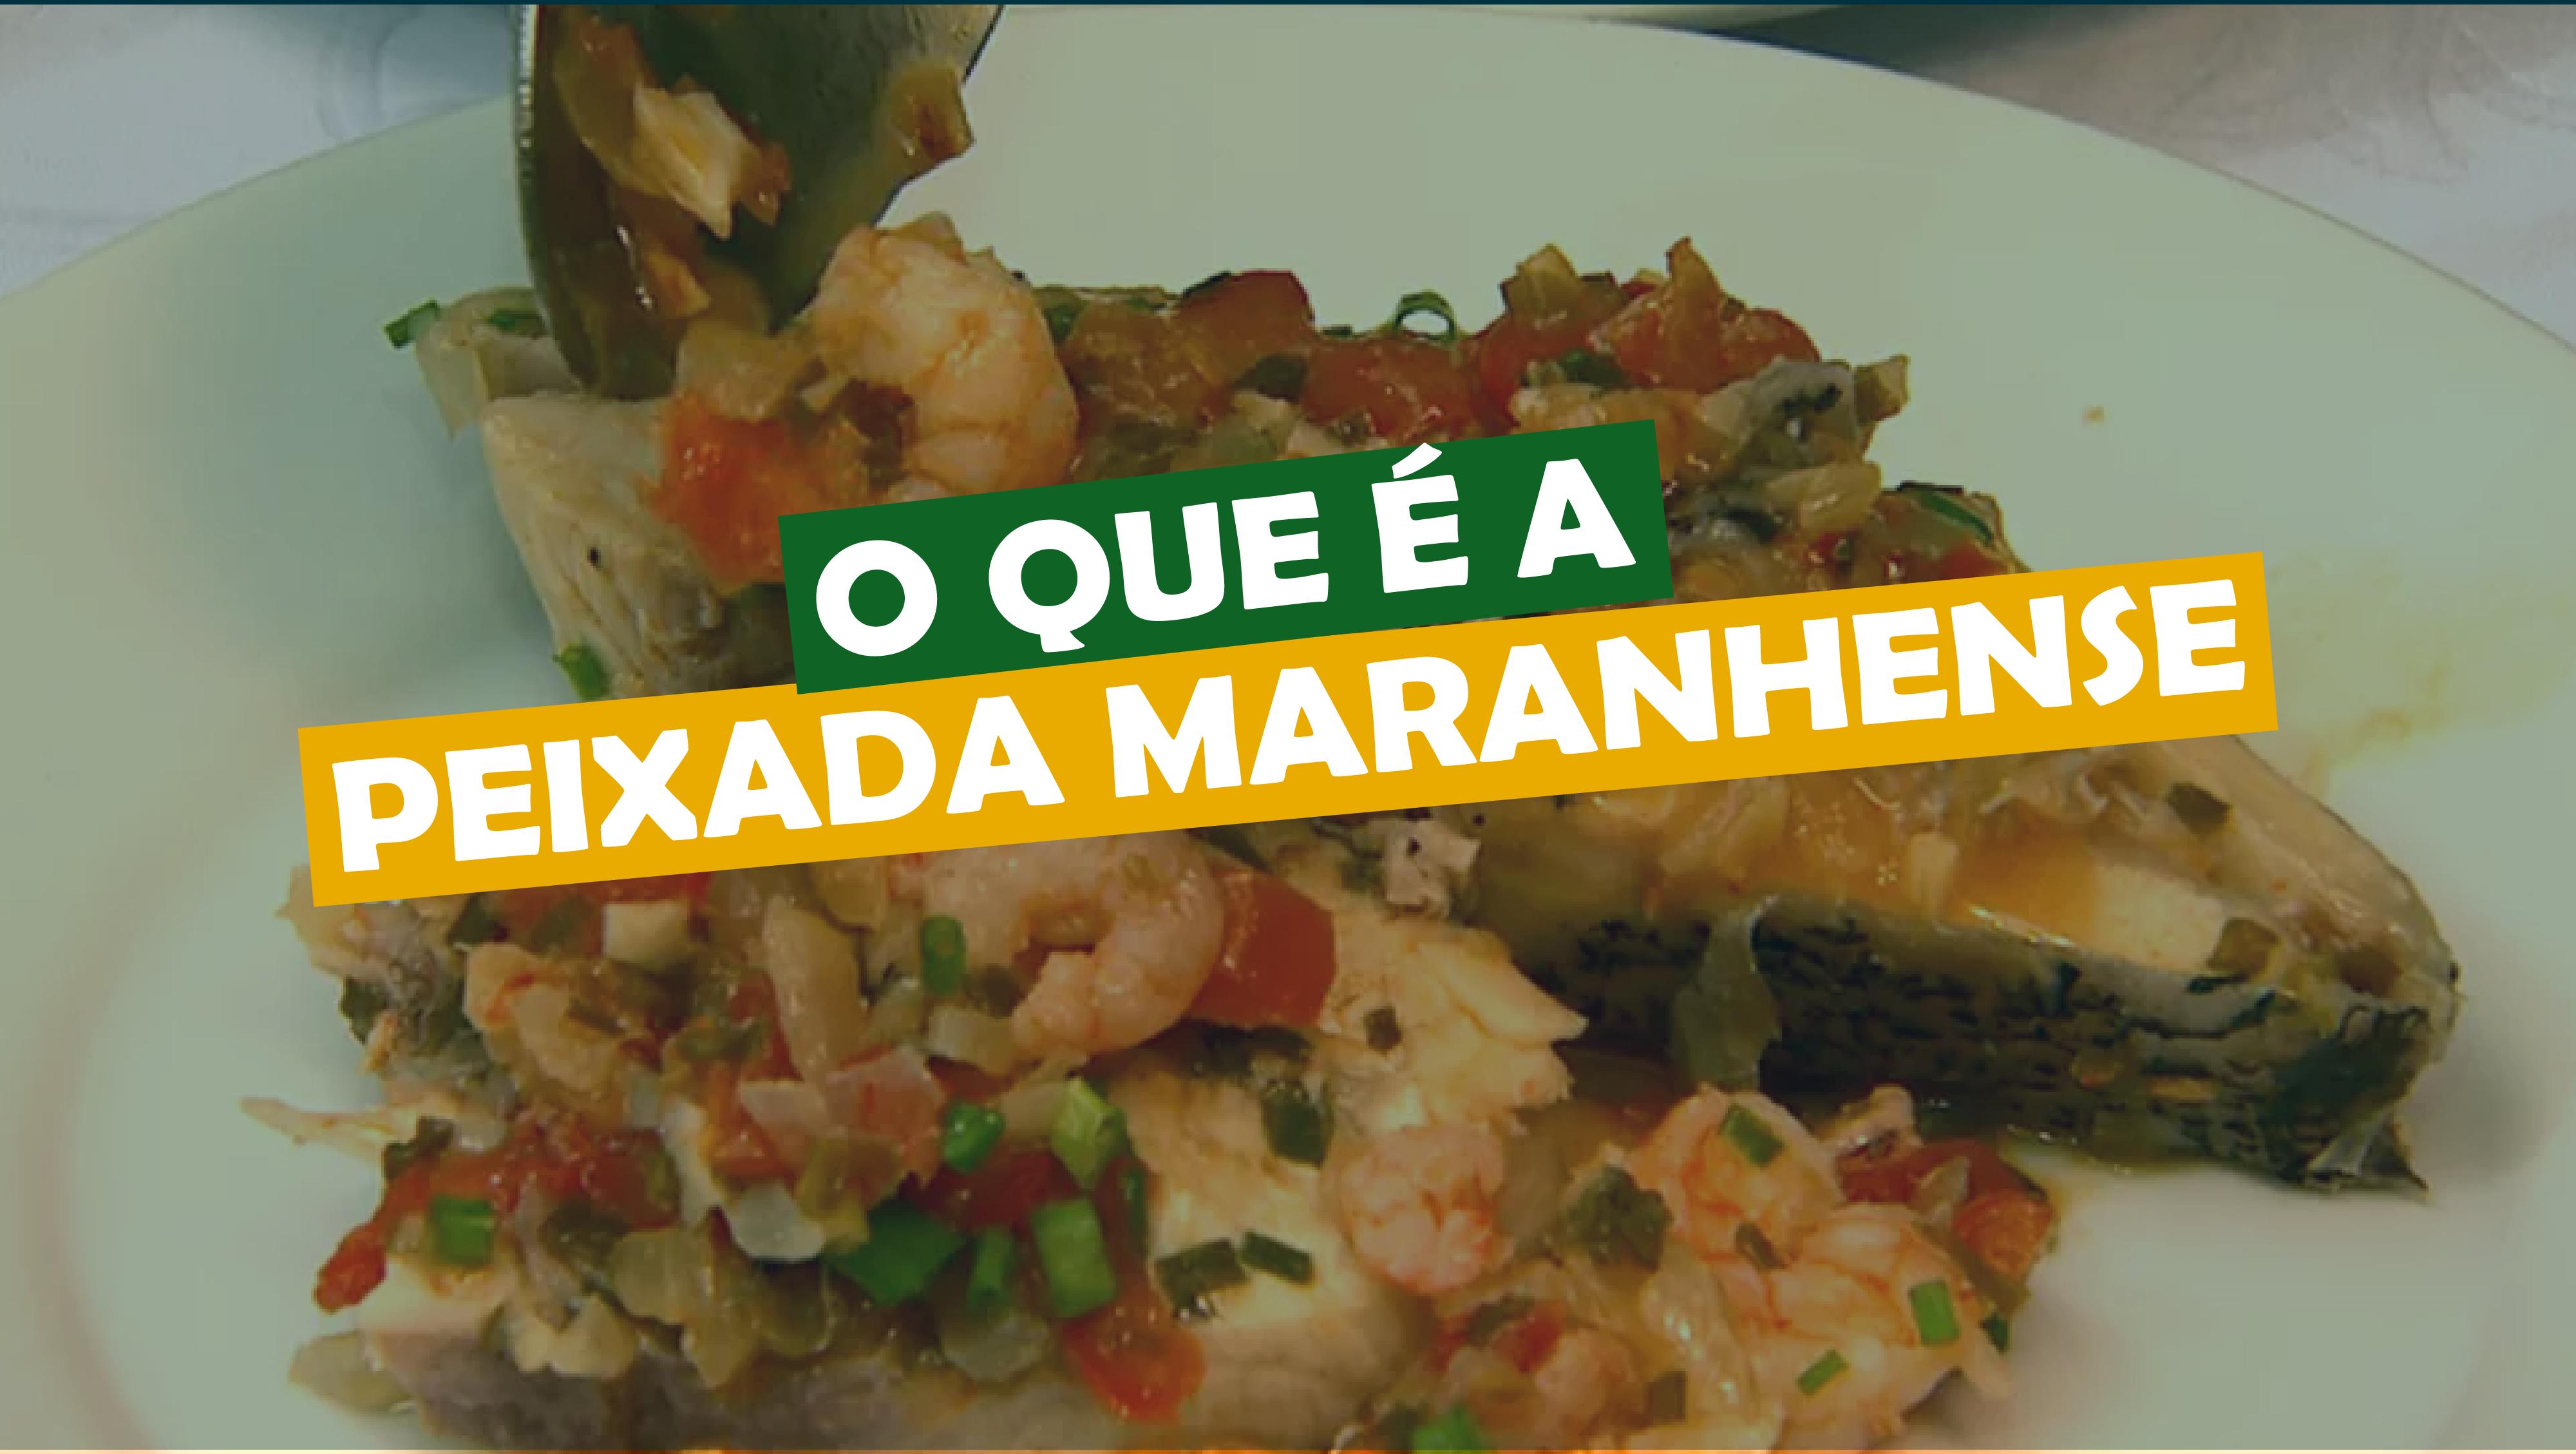 You are currently viewing O que é a peixada maranhense